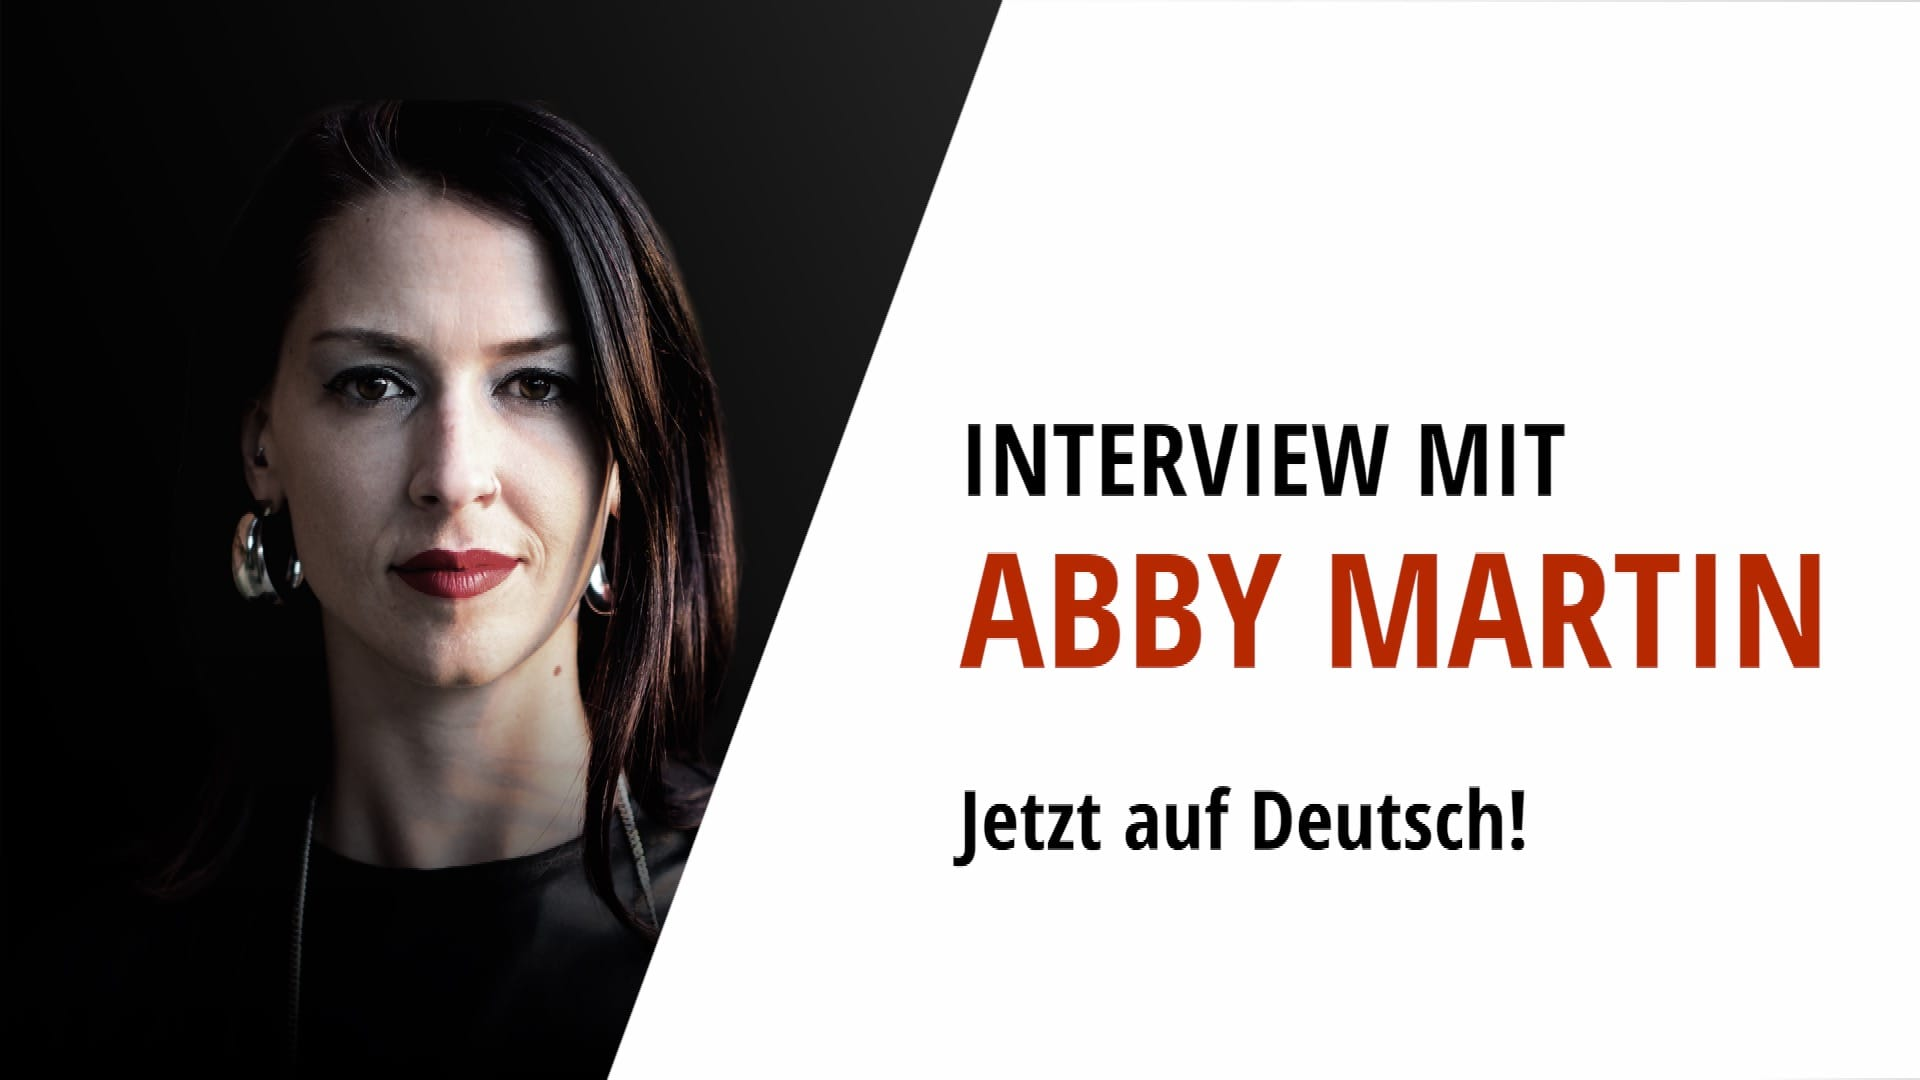 Abby Martin Deutsch acTVism